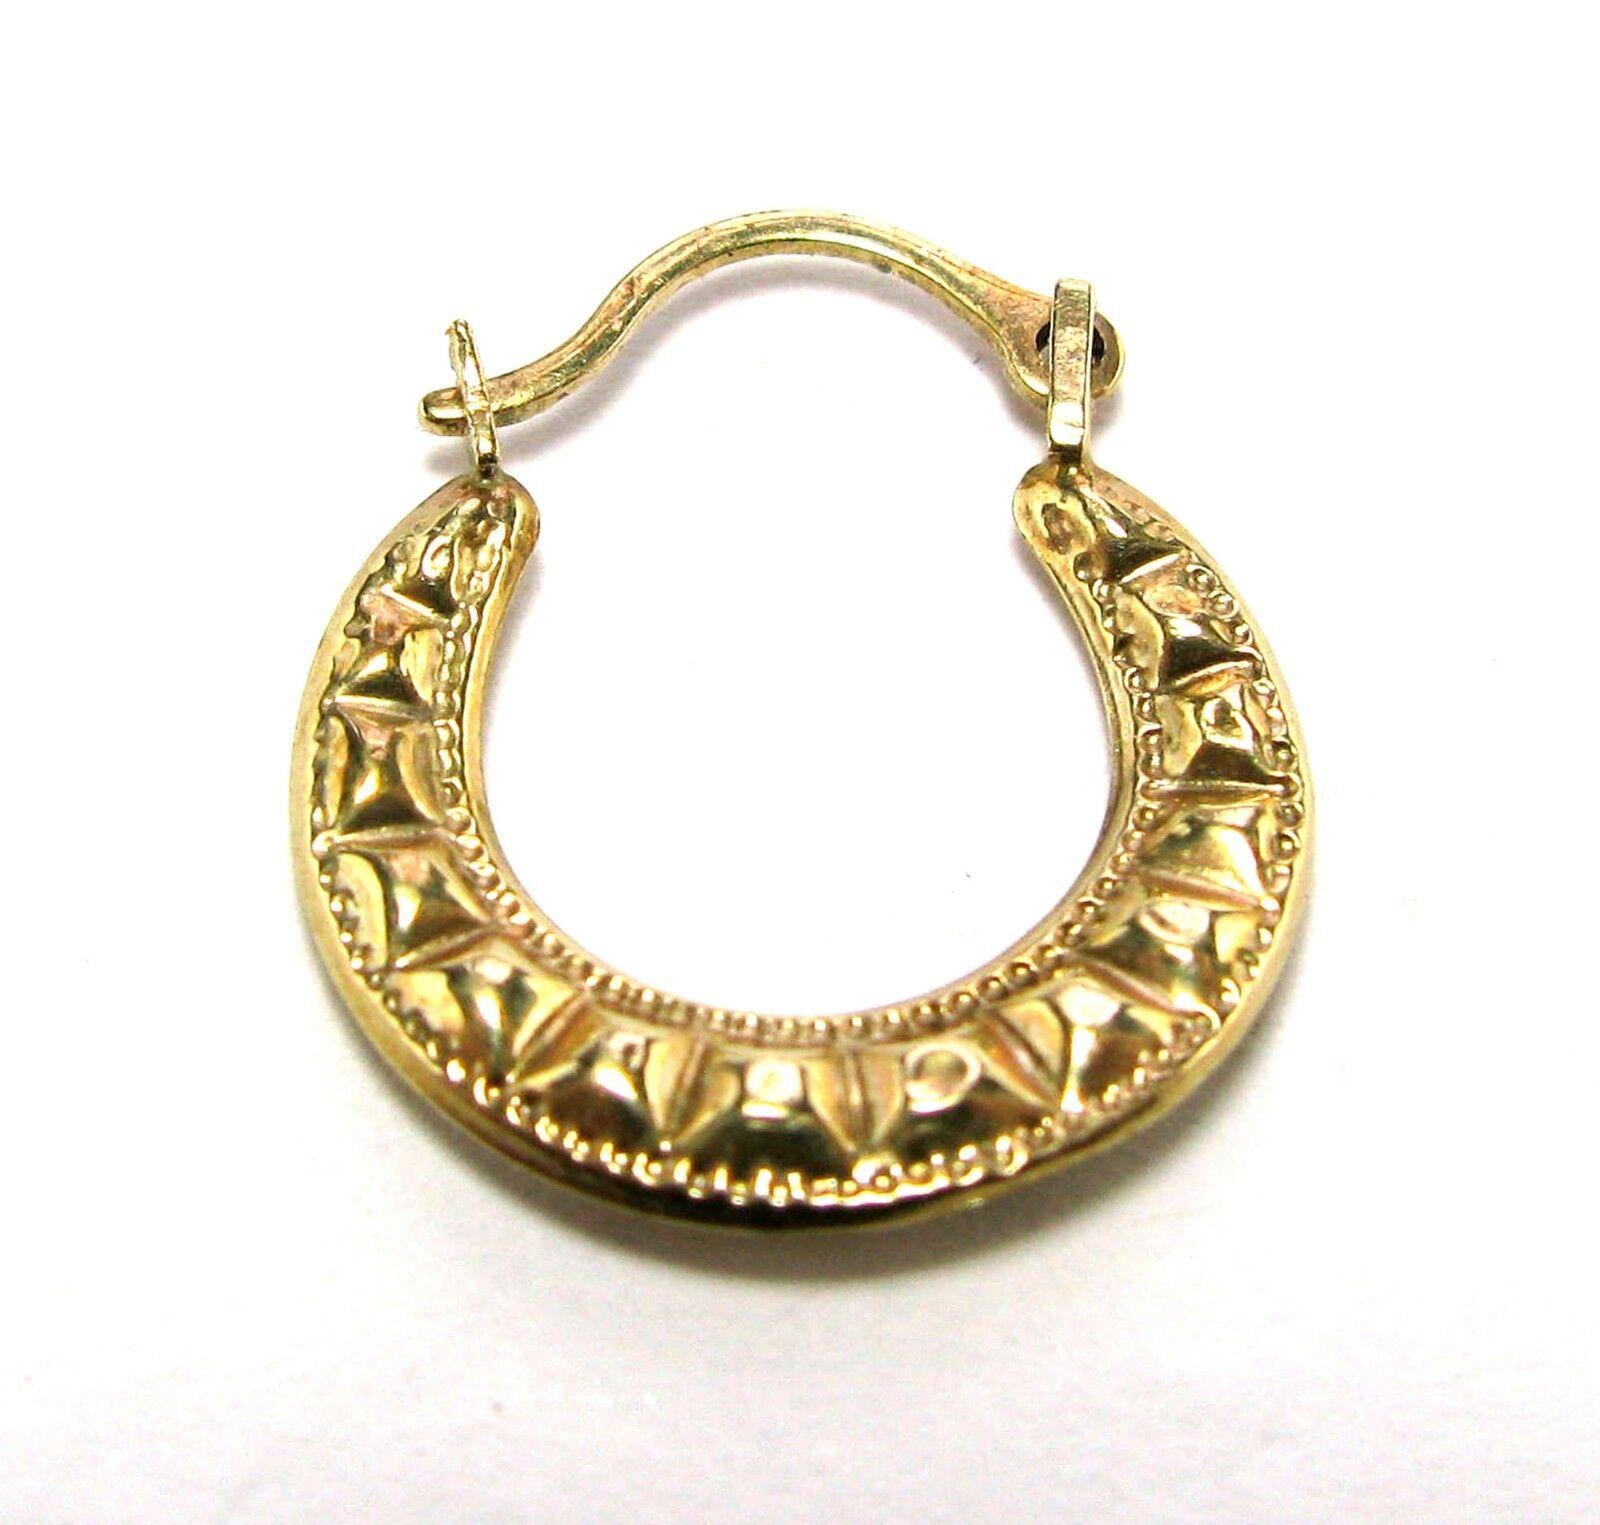 Single Hoop Earring 10K yellow gold 17 mm tall